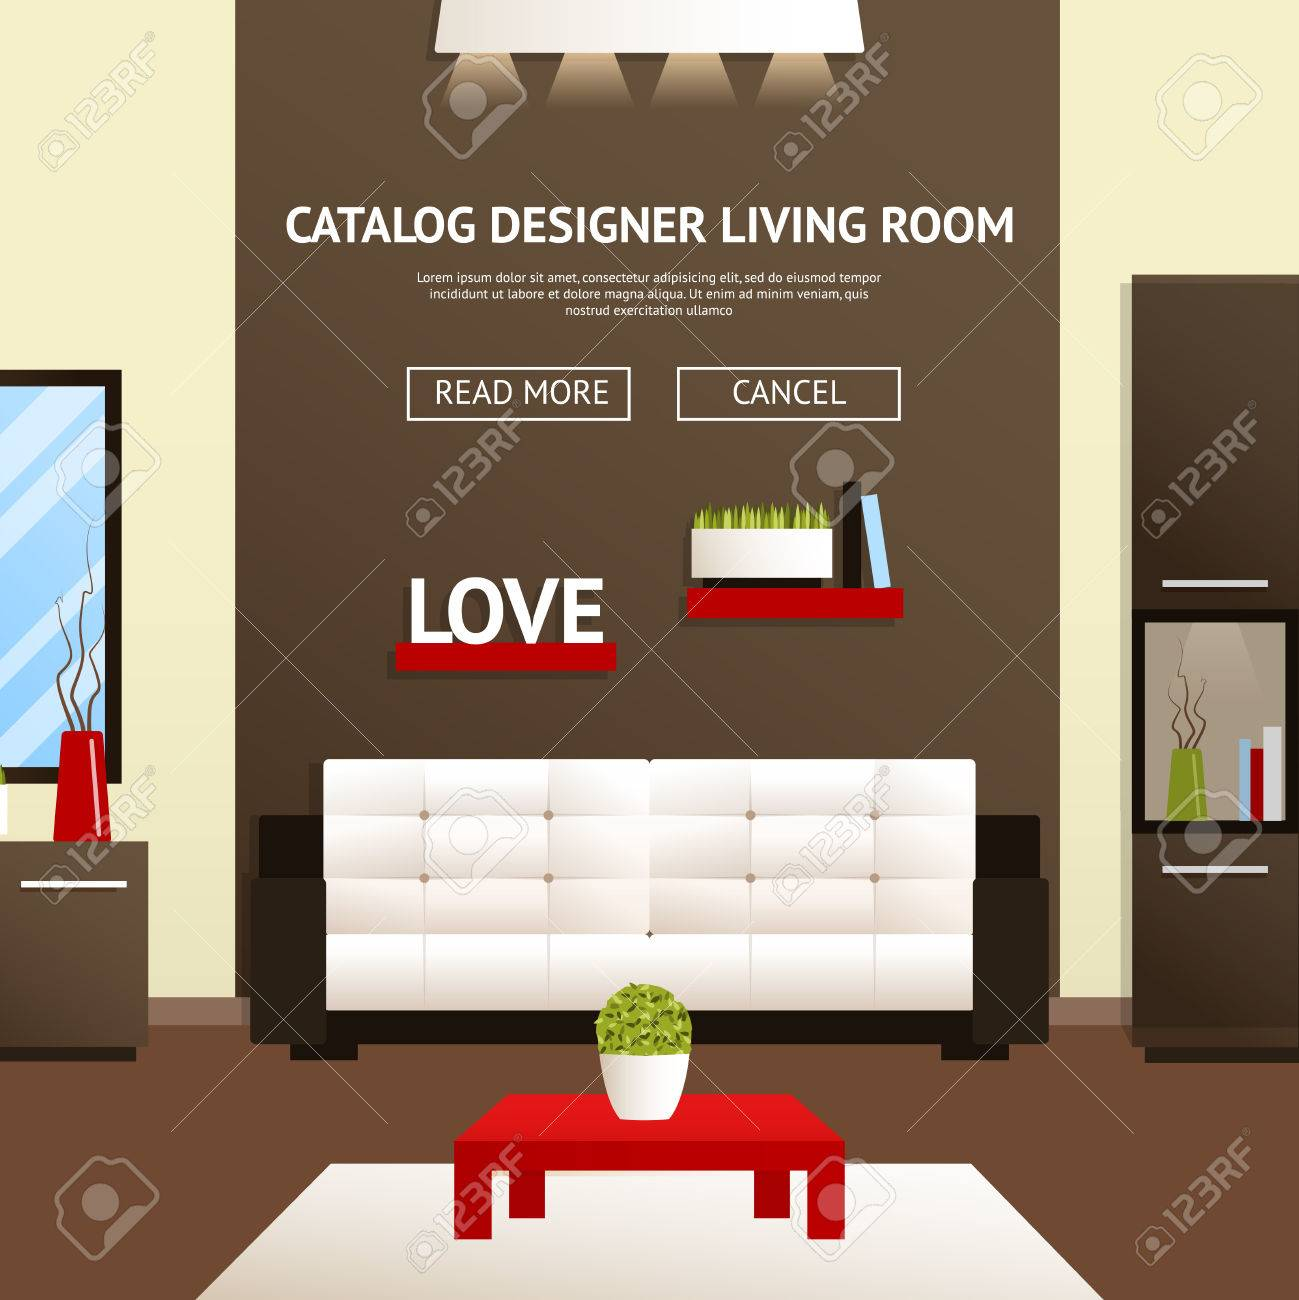 Living Room Furniture Templates designer catalog template of modern living room furniture vector